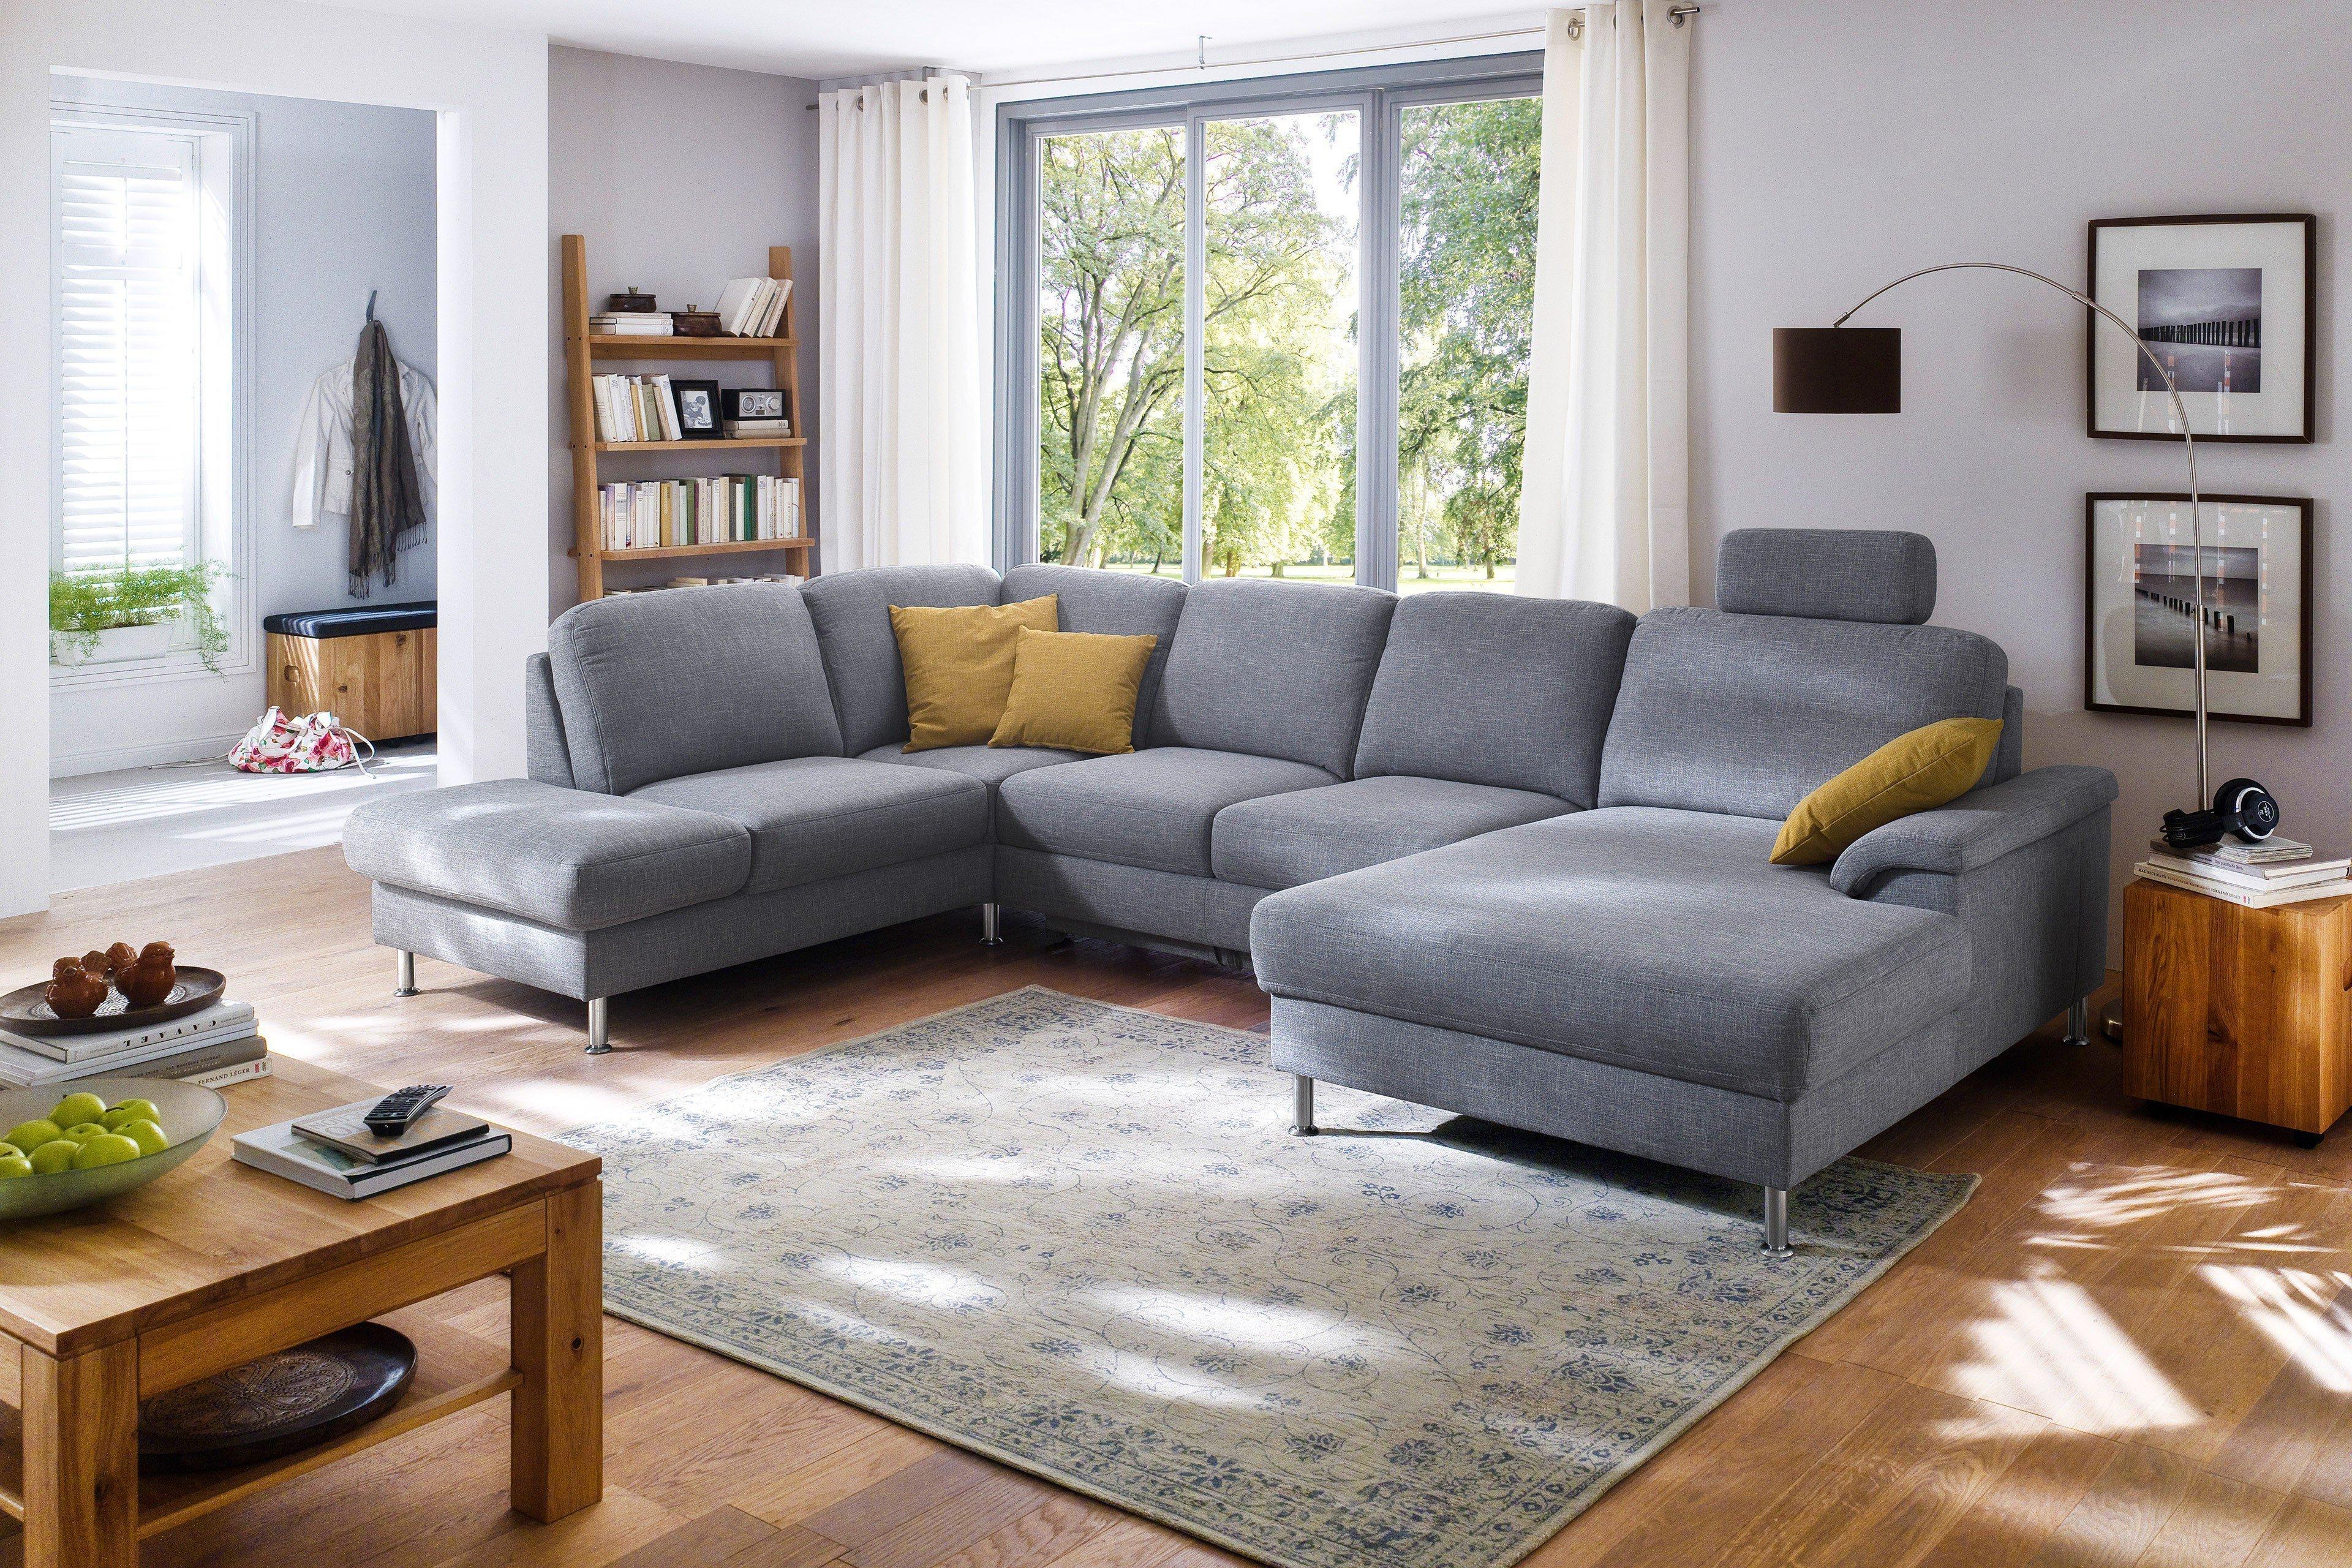 Carina Polstermöbel U-Sofa Bella in Grau | Möbel Letz - Ihr Online-Shop